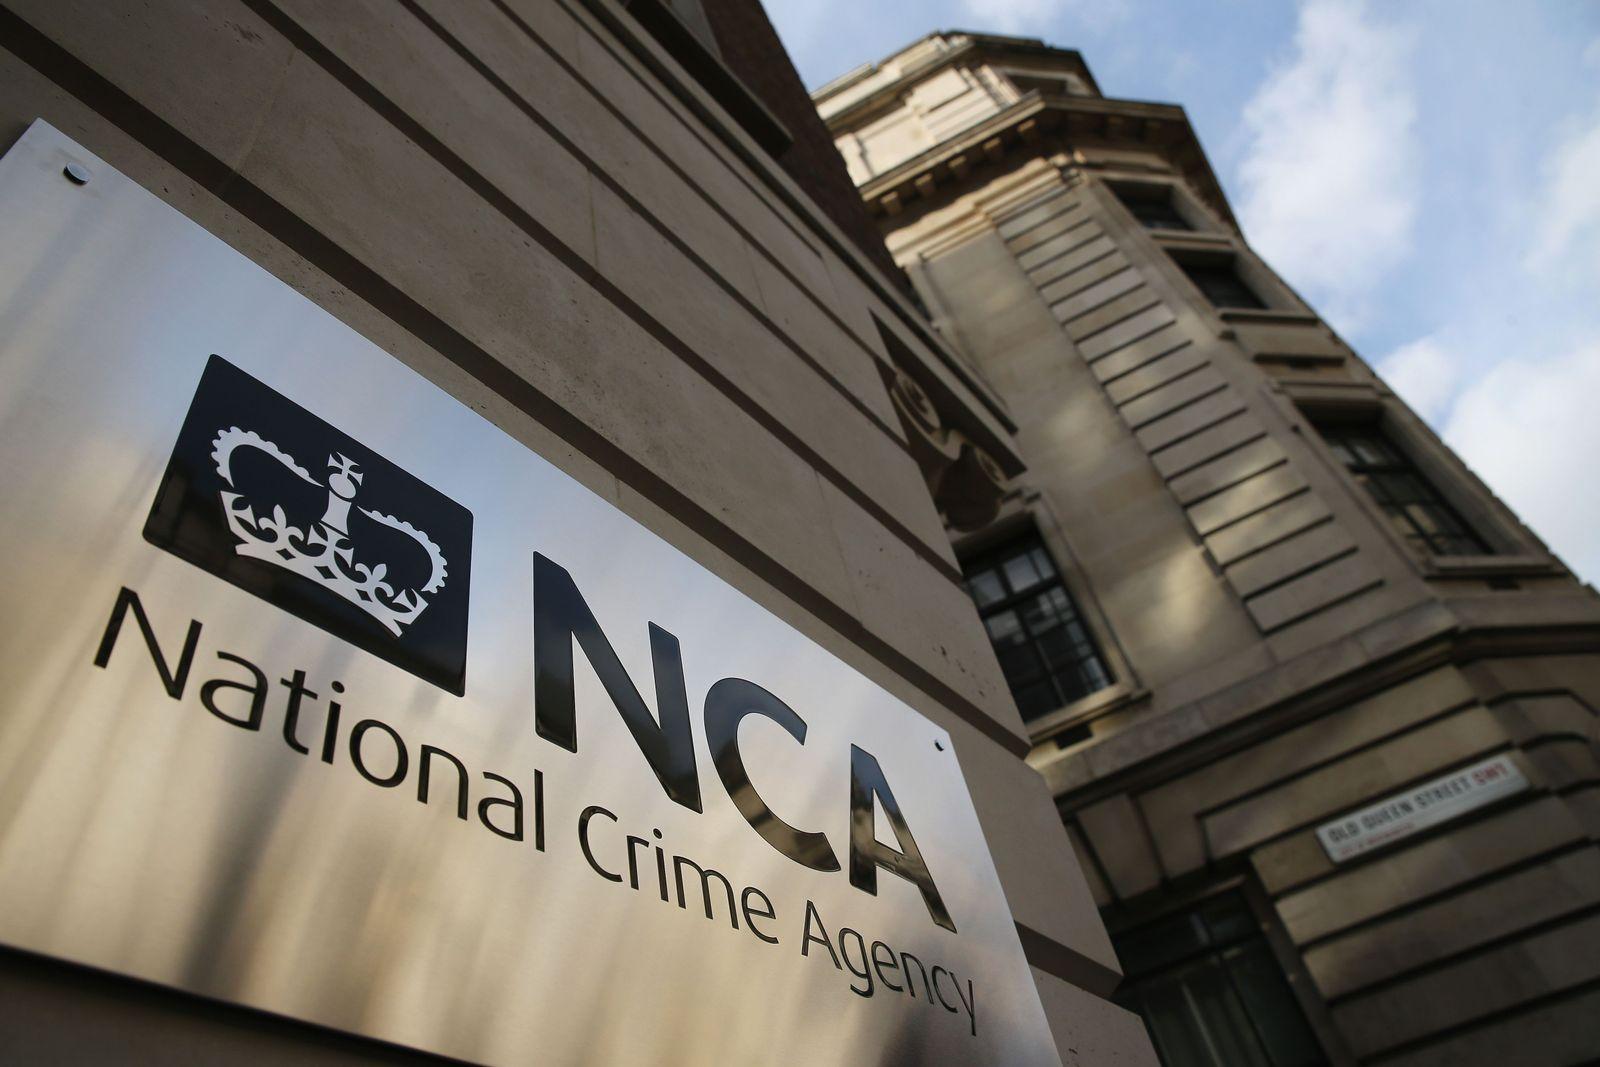 England/ National Crime Agency